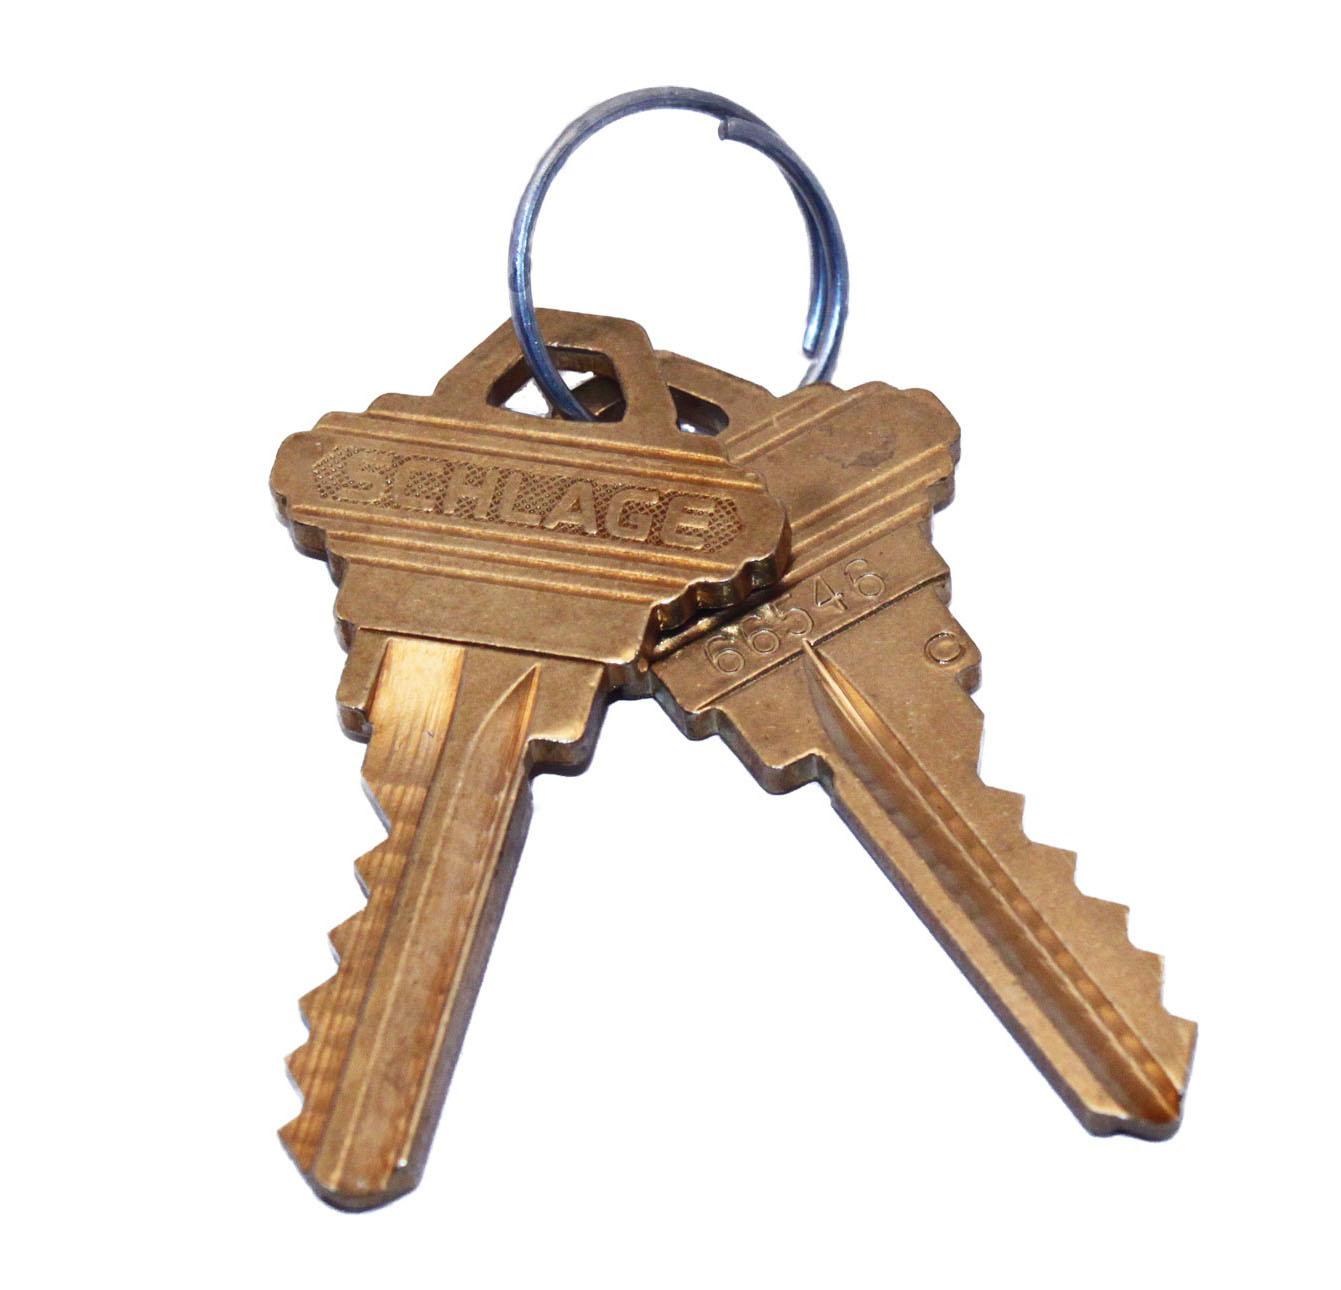 schlage-ringed-pair-of-cut-keys-5-pin-48-100-4.jpg